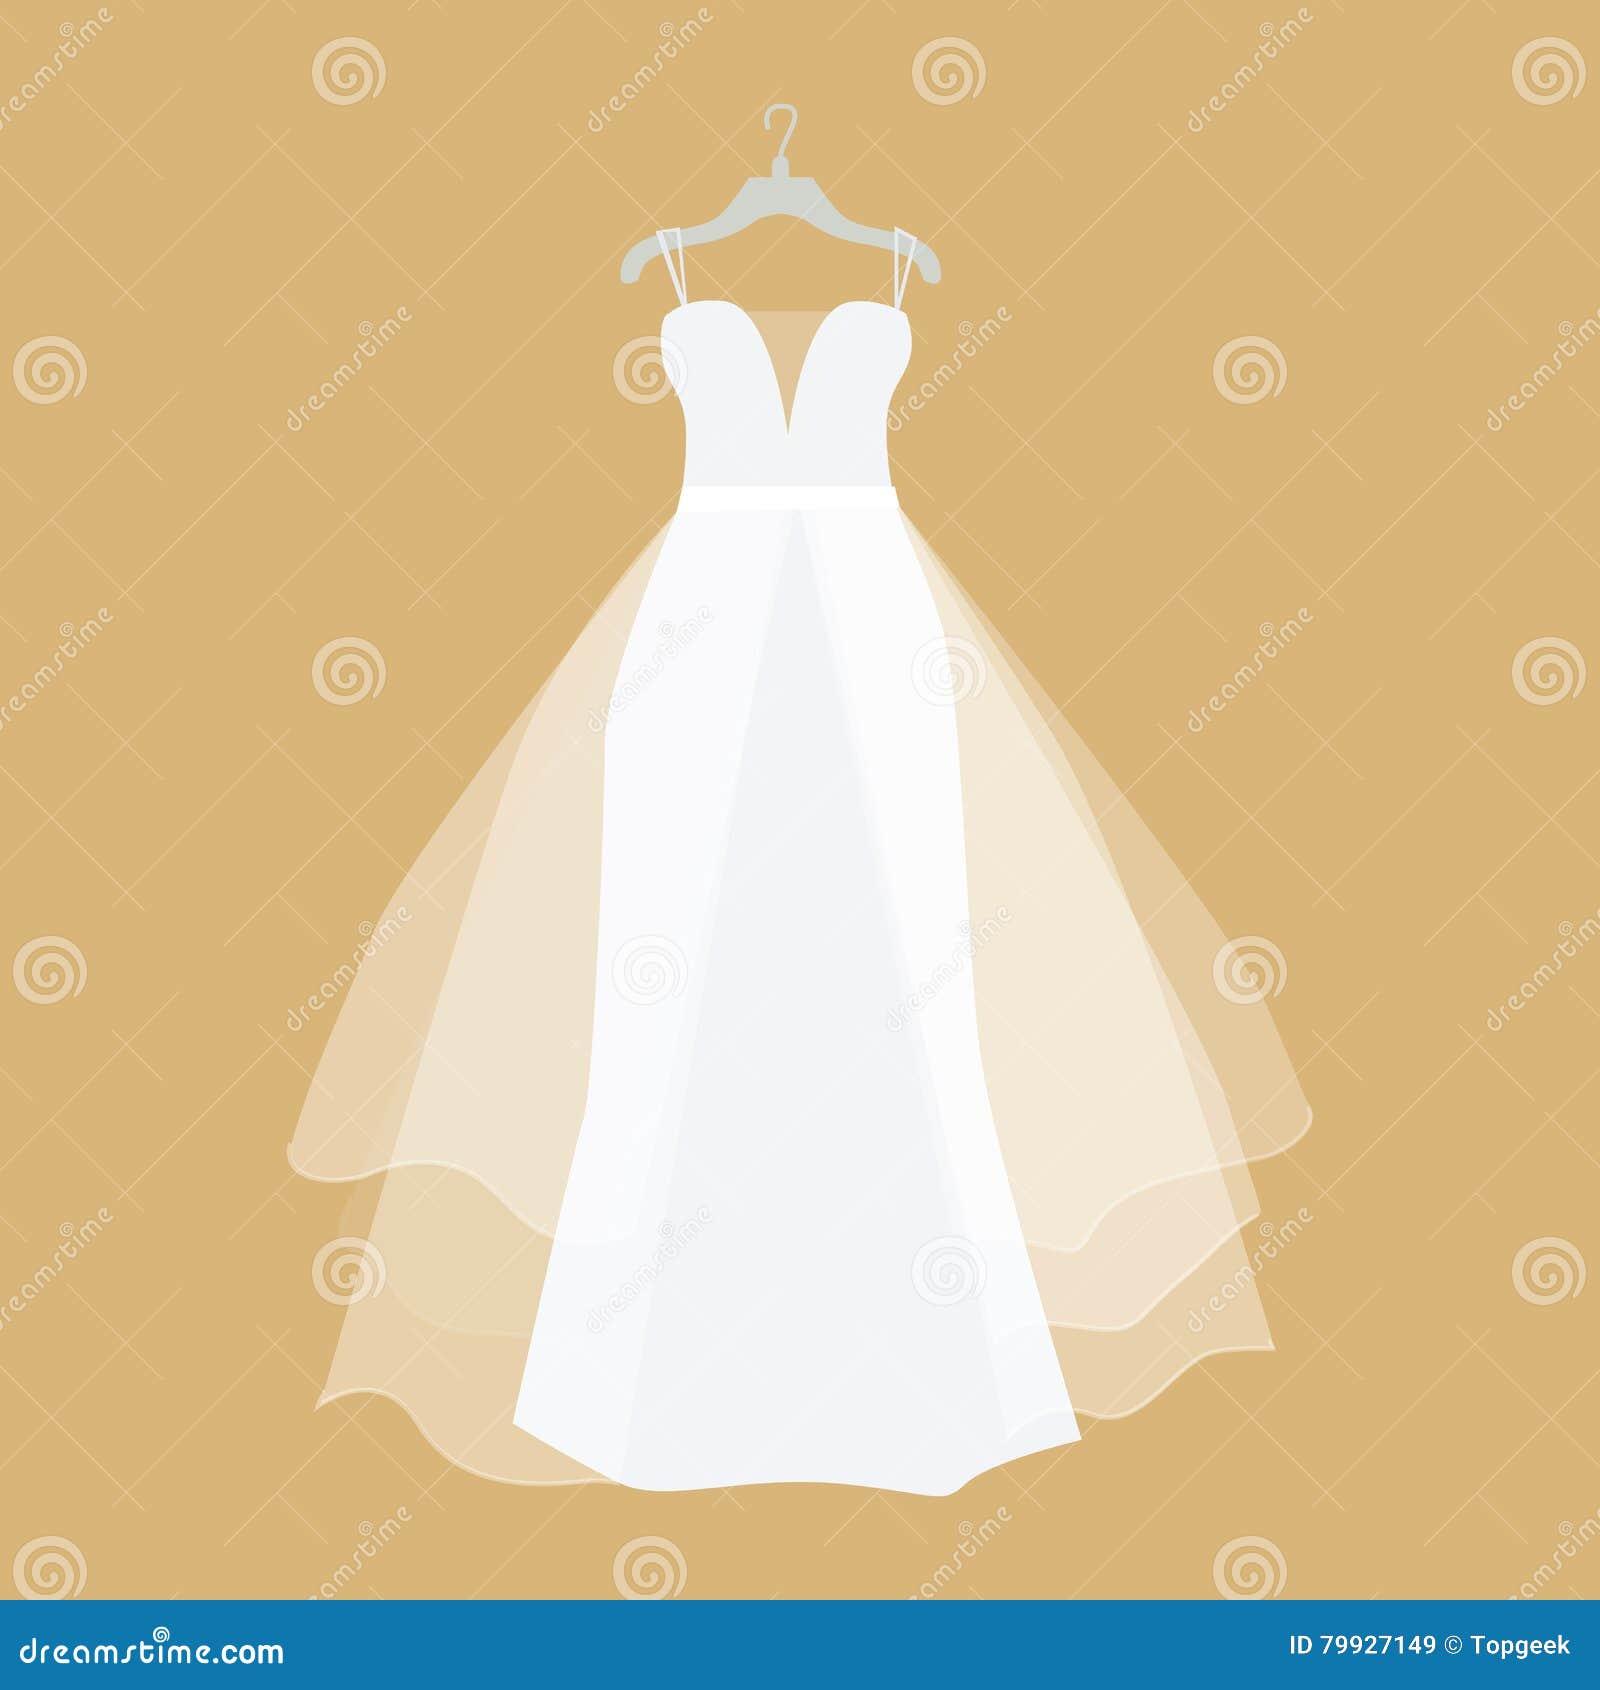 Wedding Dress Vector Illustration In Flat Design Cartoon